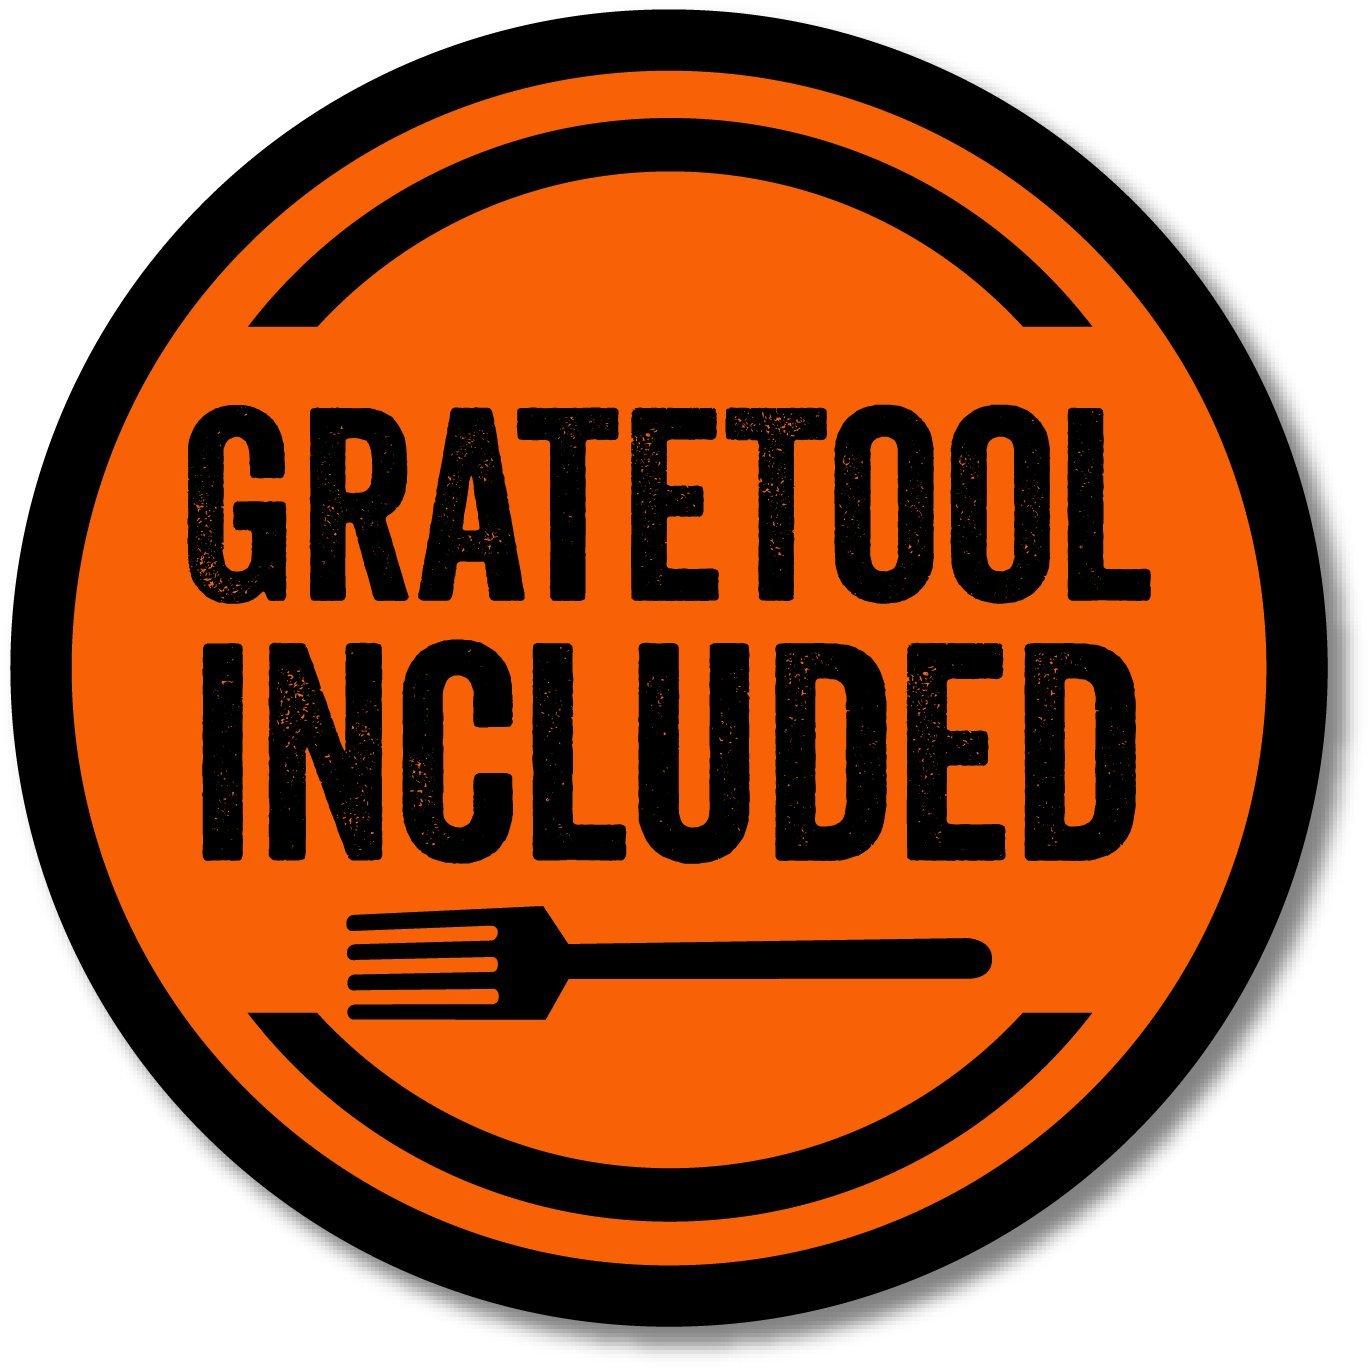 Set of Three 13.75 GrillGrates Grate Tool interlocking